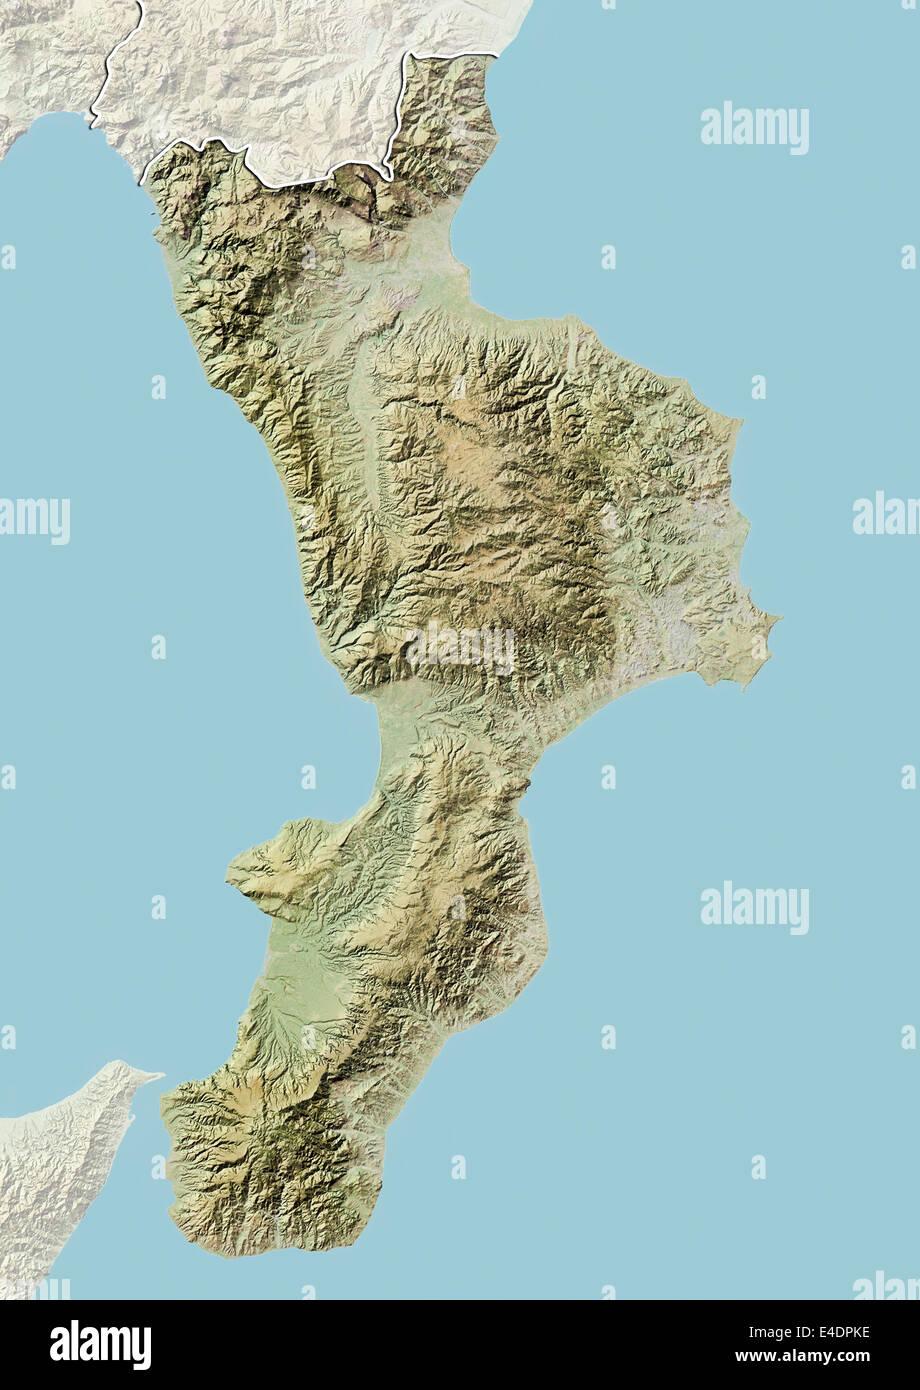 Cartina Calabria Immagini.Map Of Calabria Immagini E Fotos Stock Alamy